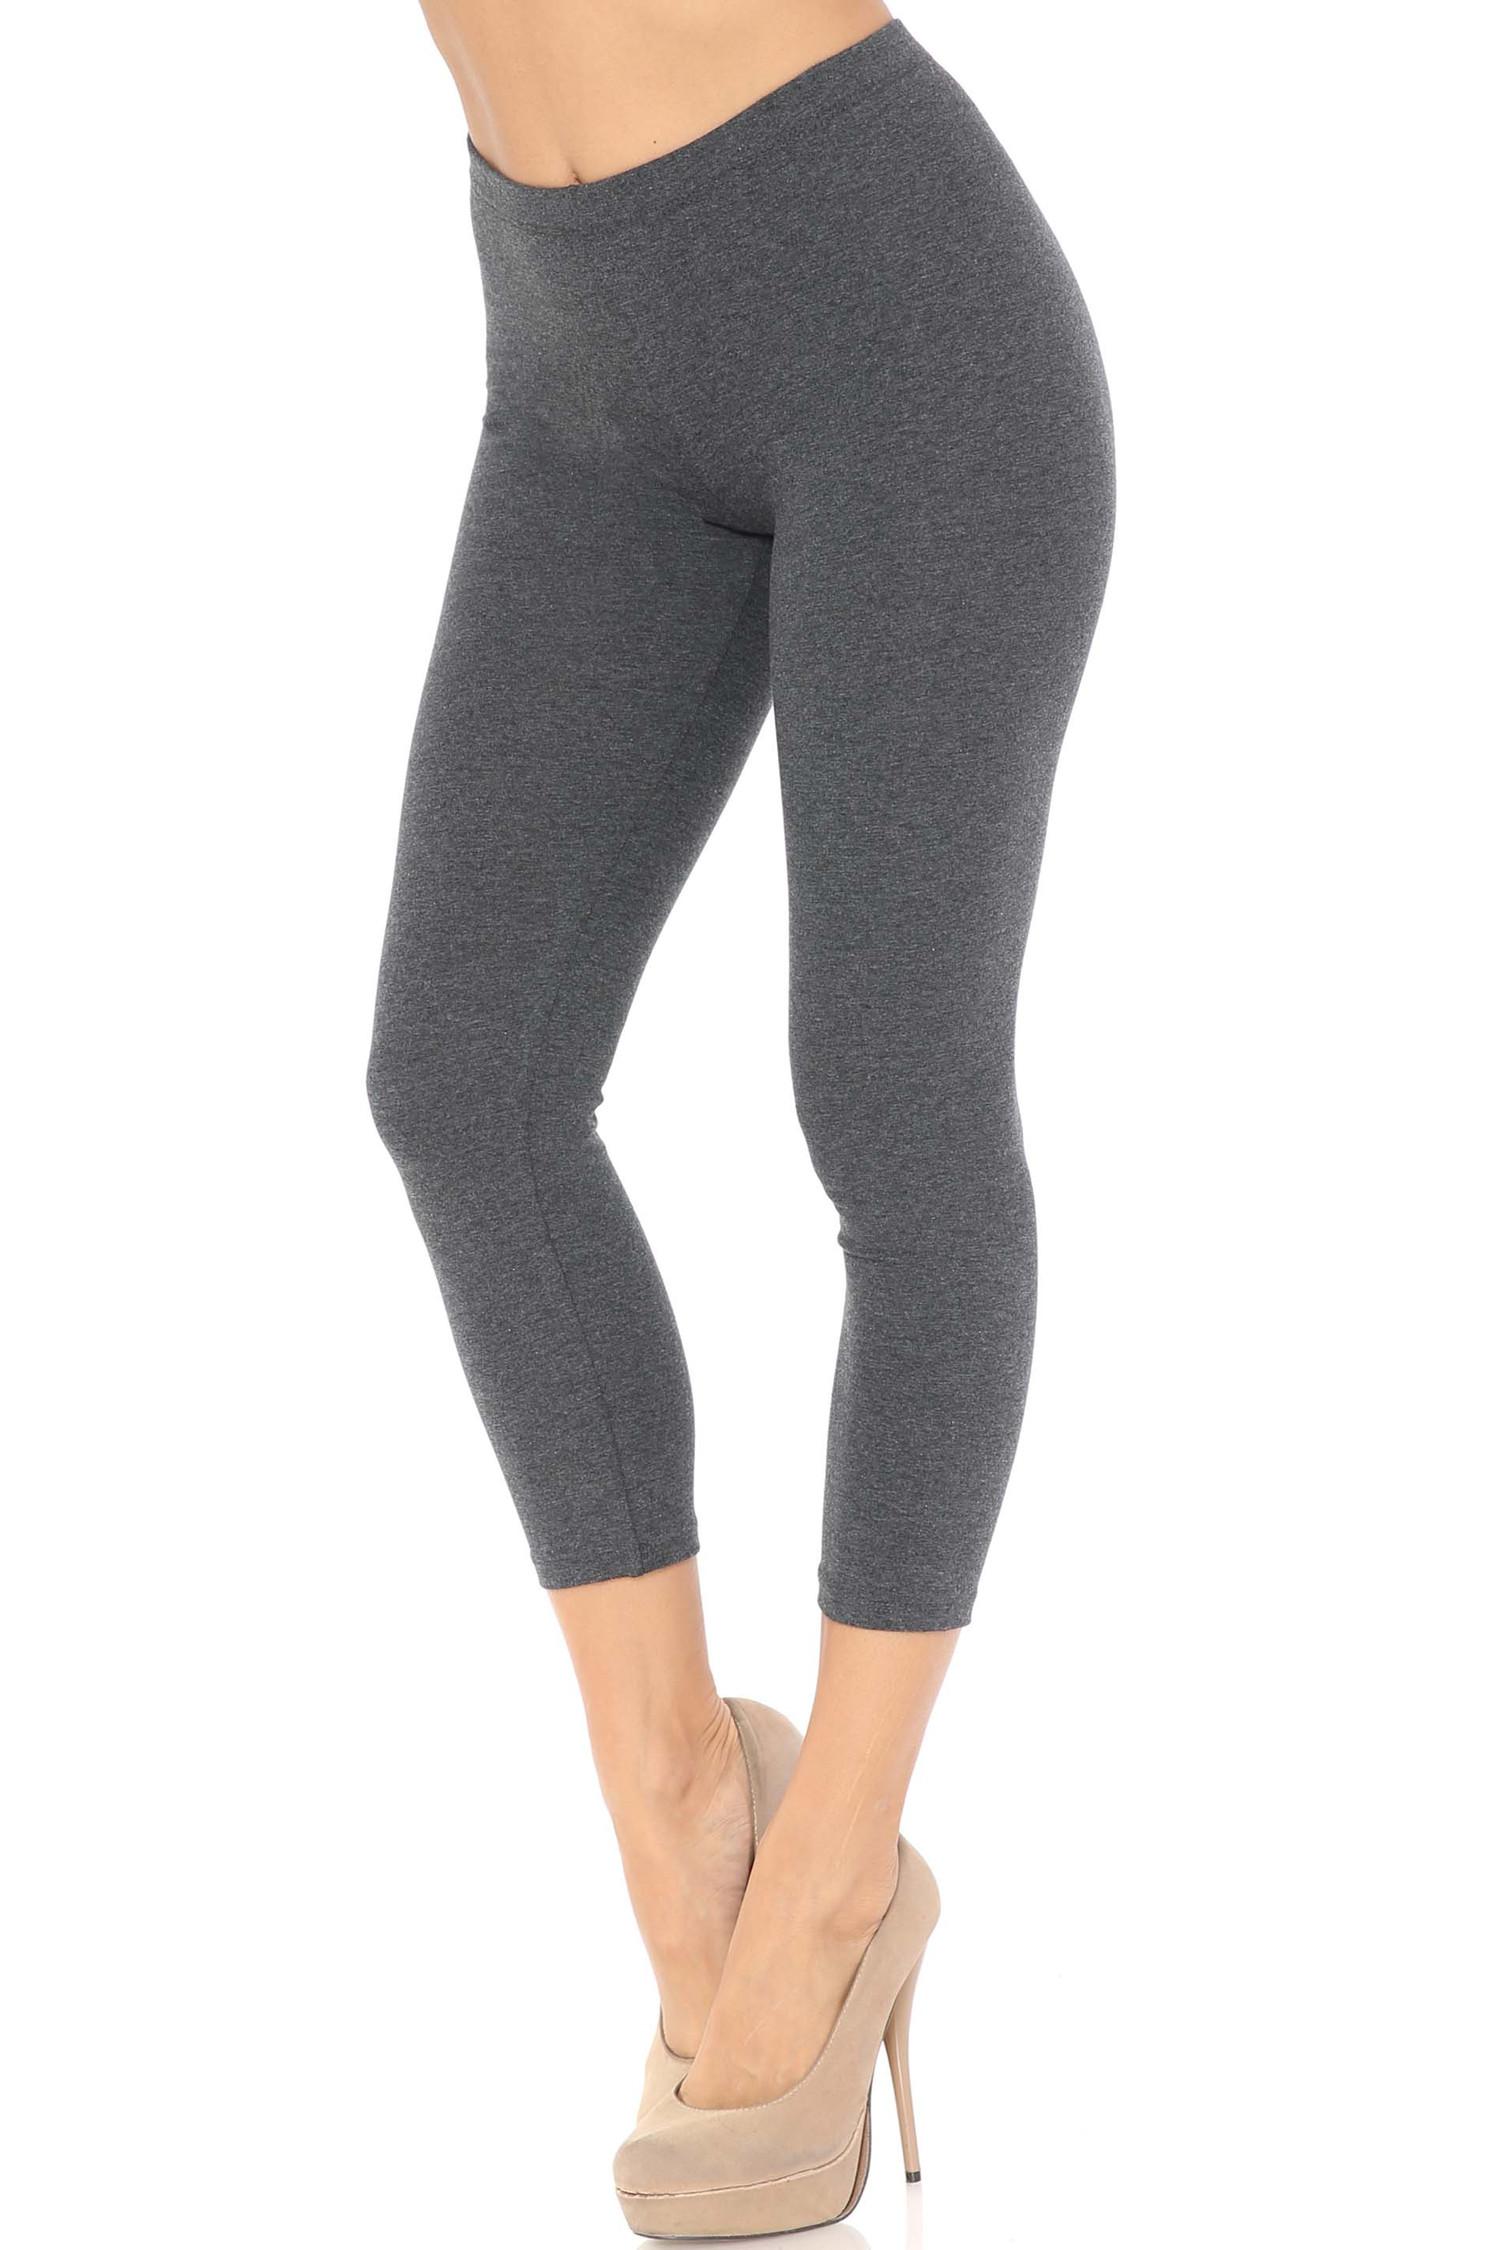 45 degree angle of charcoal USA Cotton Capri Length Leggings